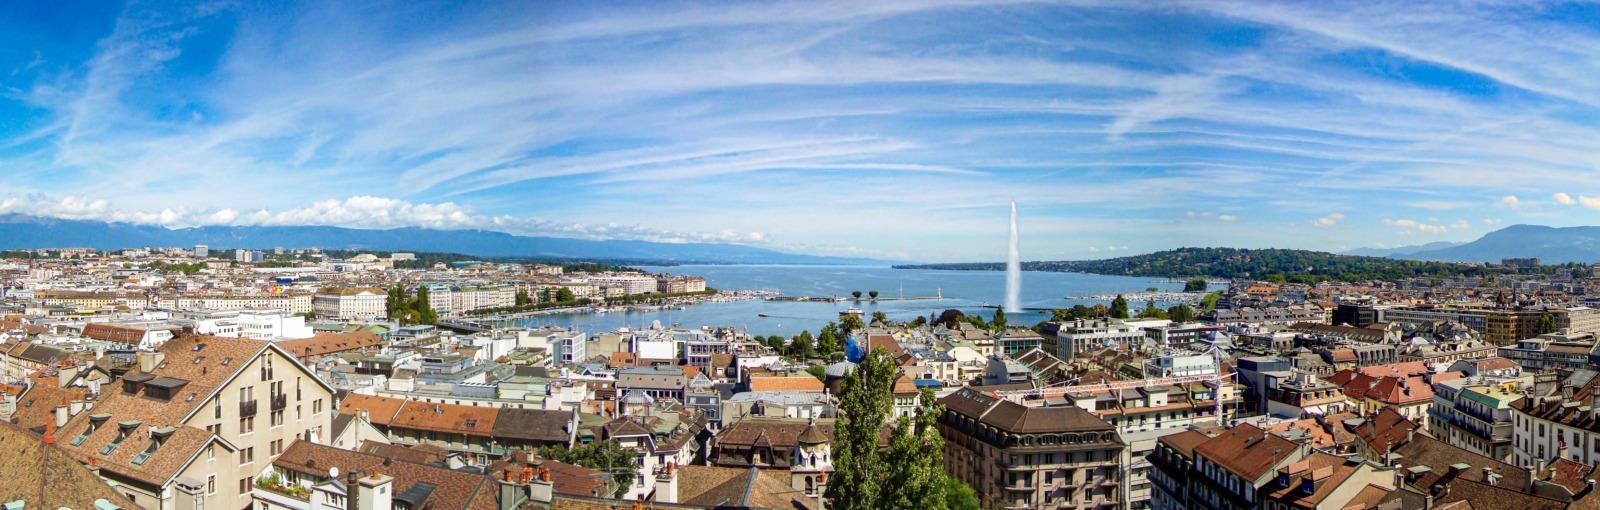 Genève. Photo by Christoph Rohner [Public Domain]